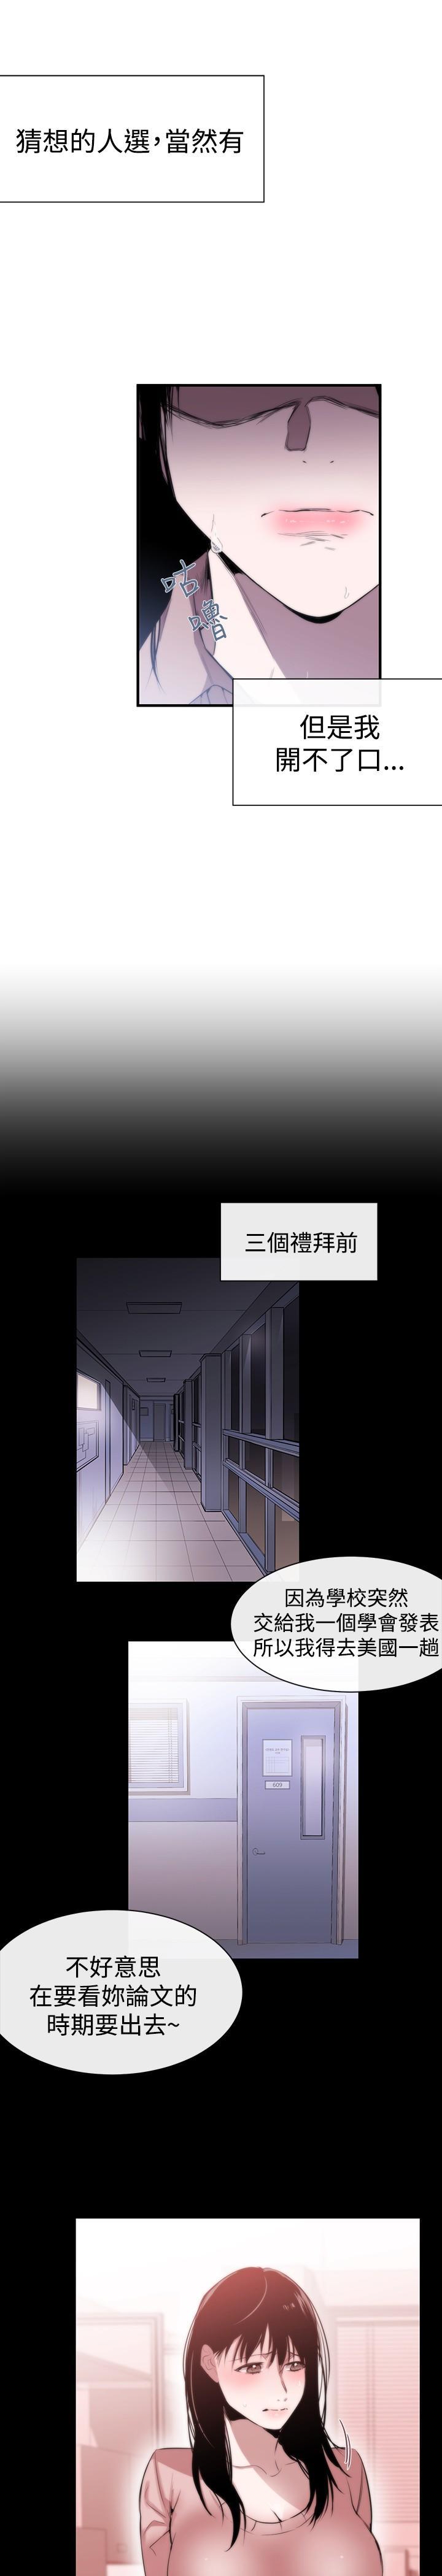 Female Disciple 女助教 Ch.1~8 [Chinese]中文 213